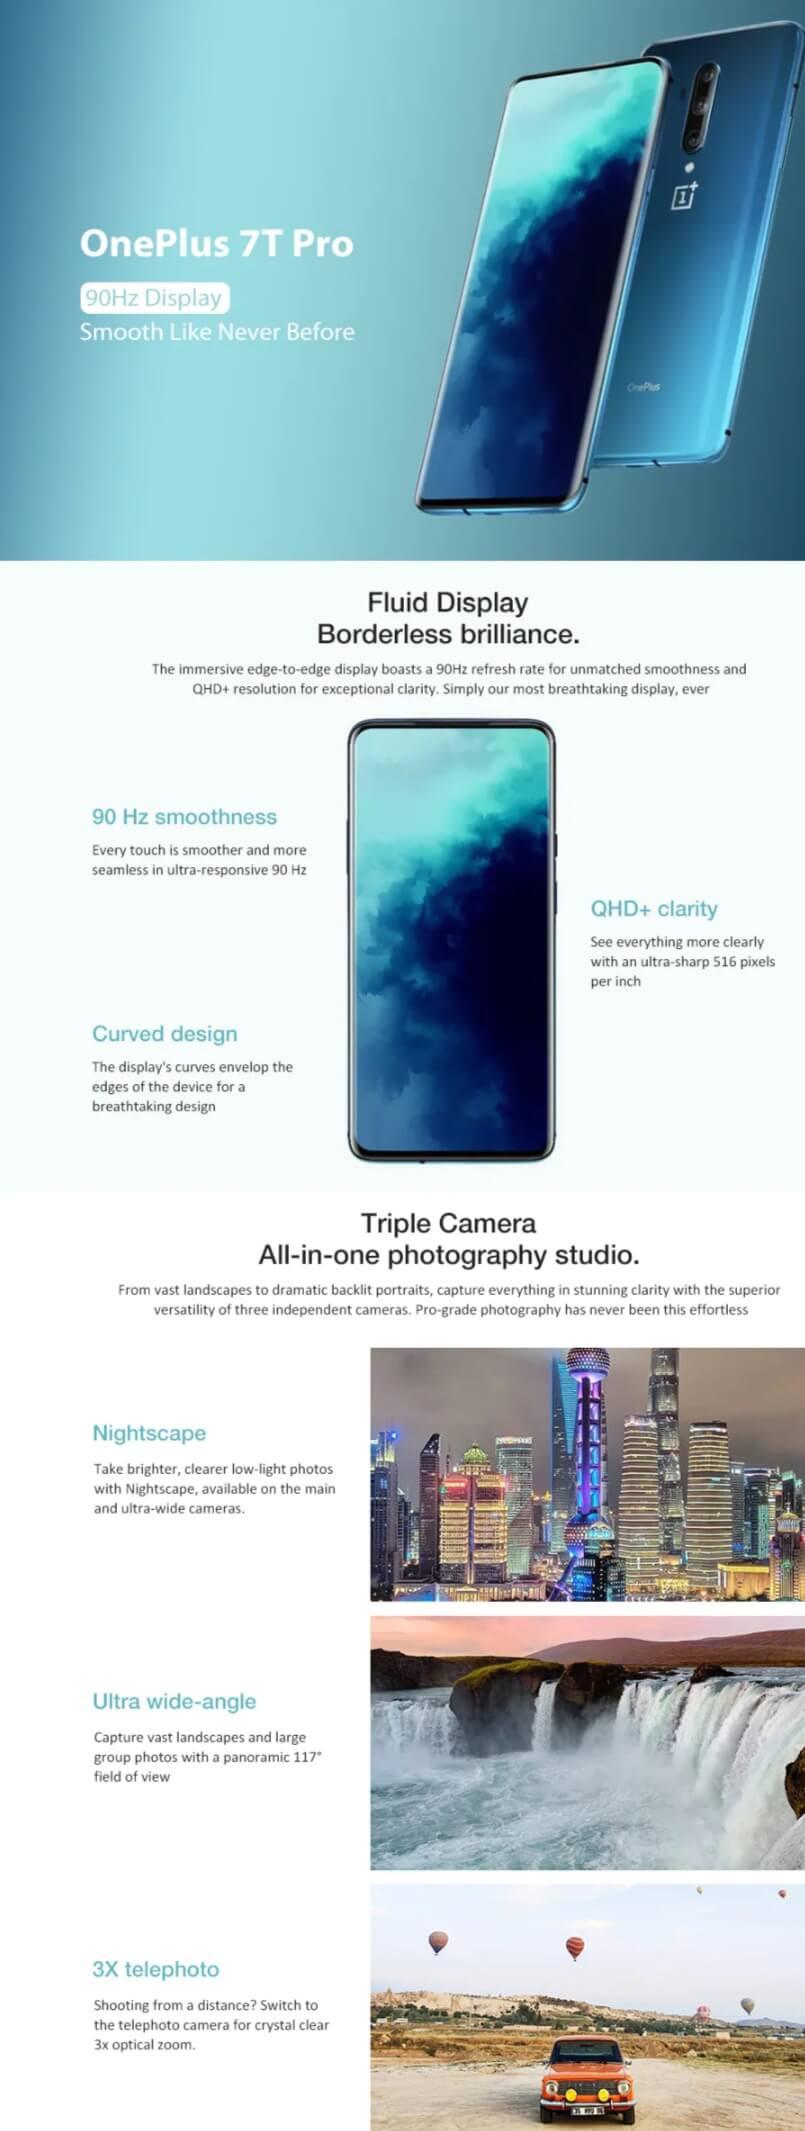 Oneplus 7T Pro 4G Smartphone